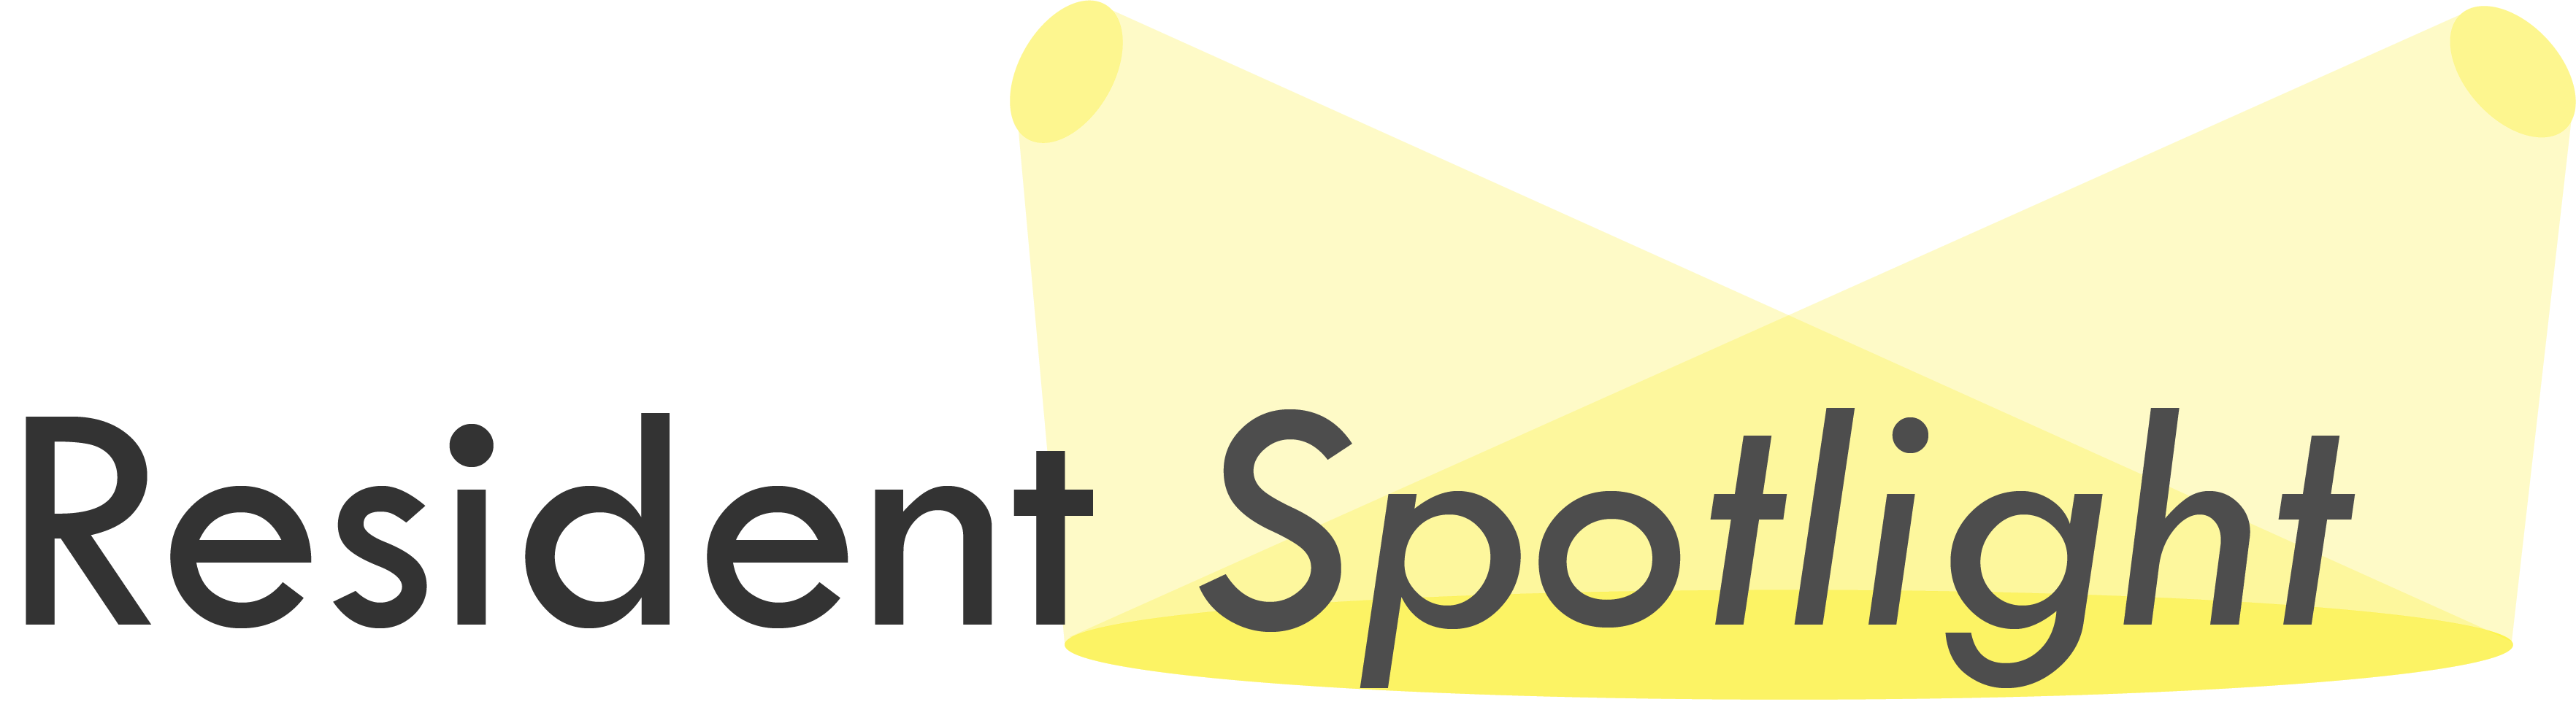 Resident Spotlight